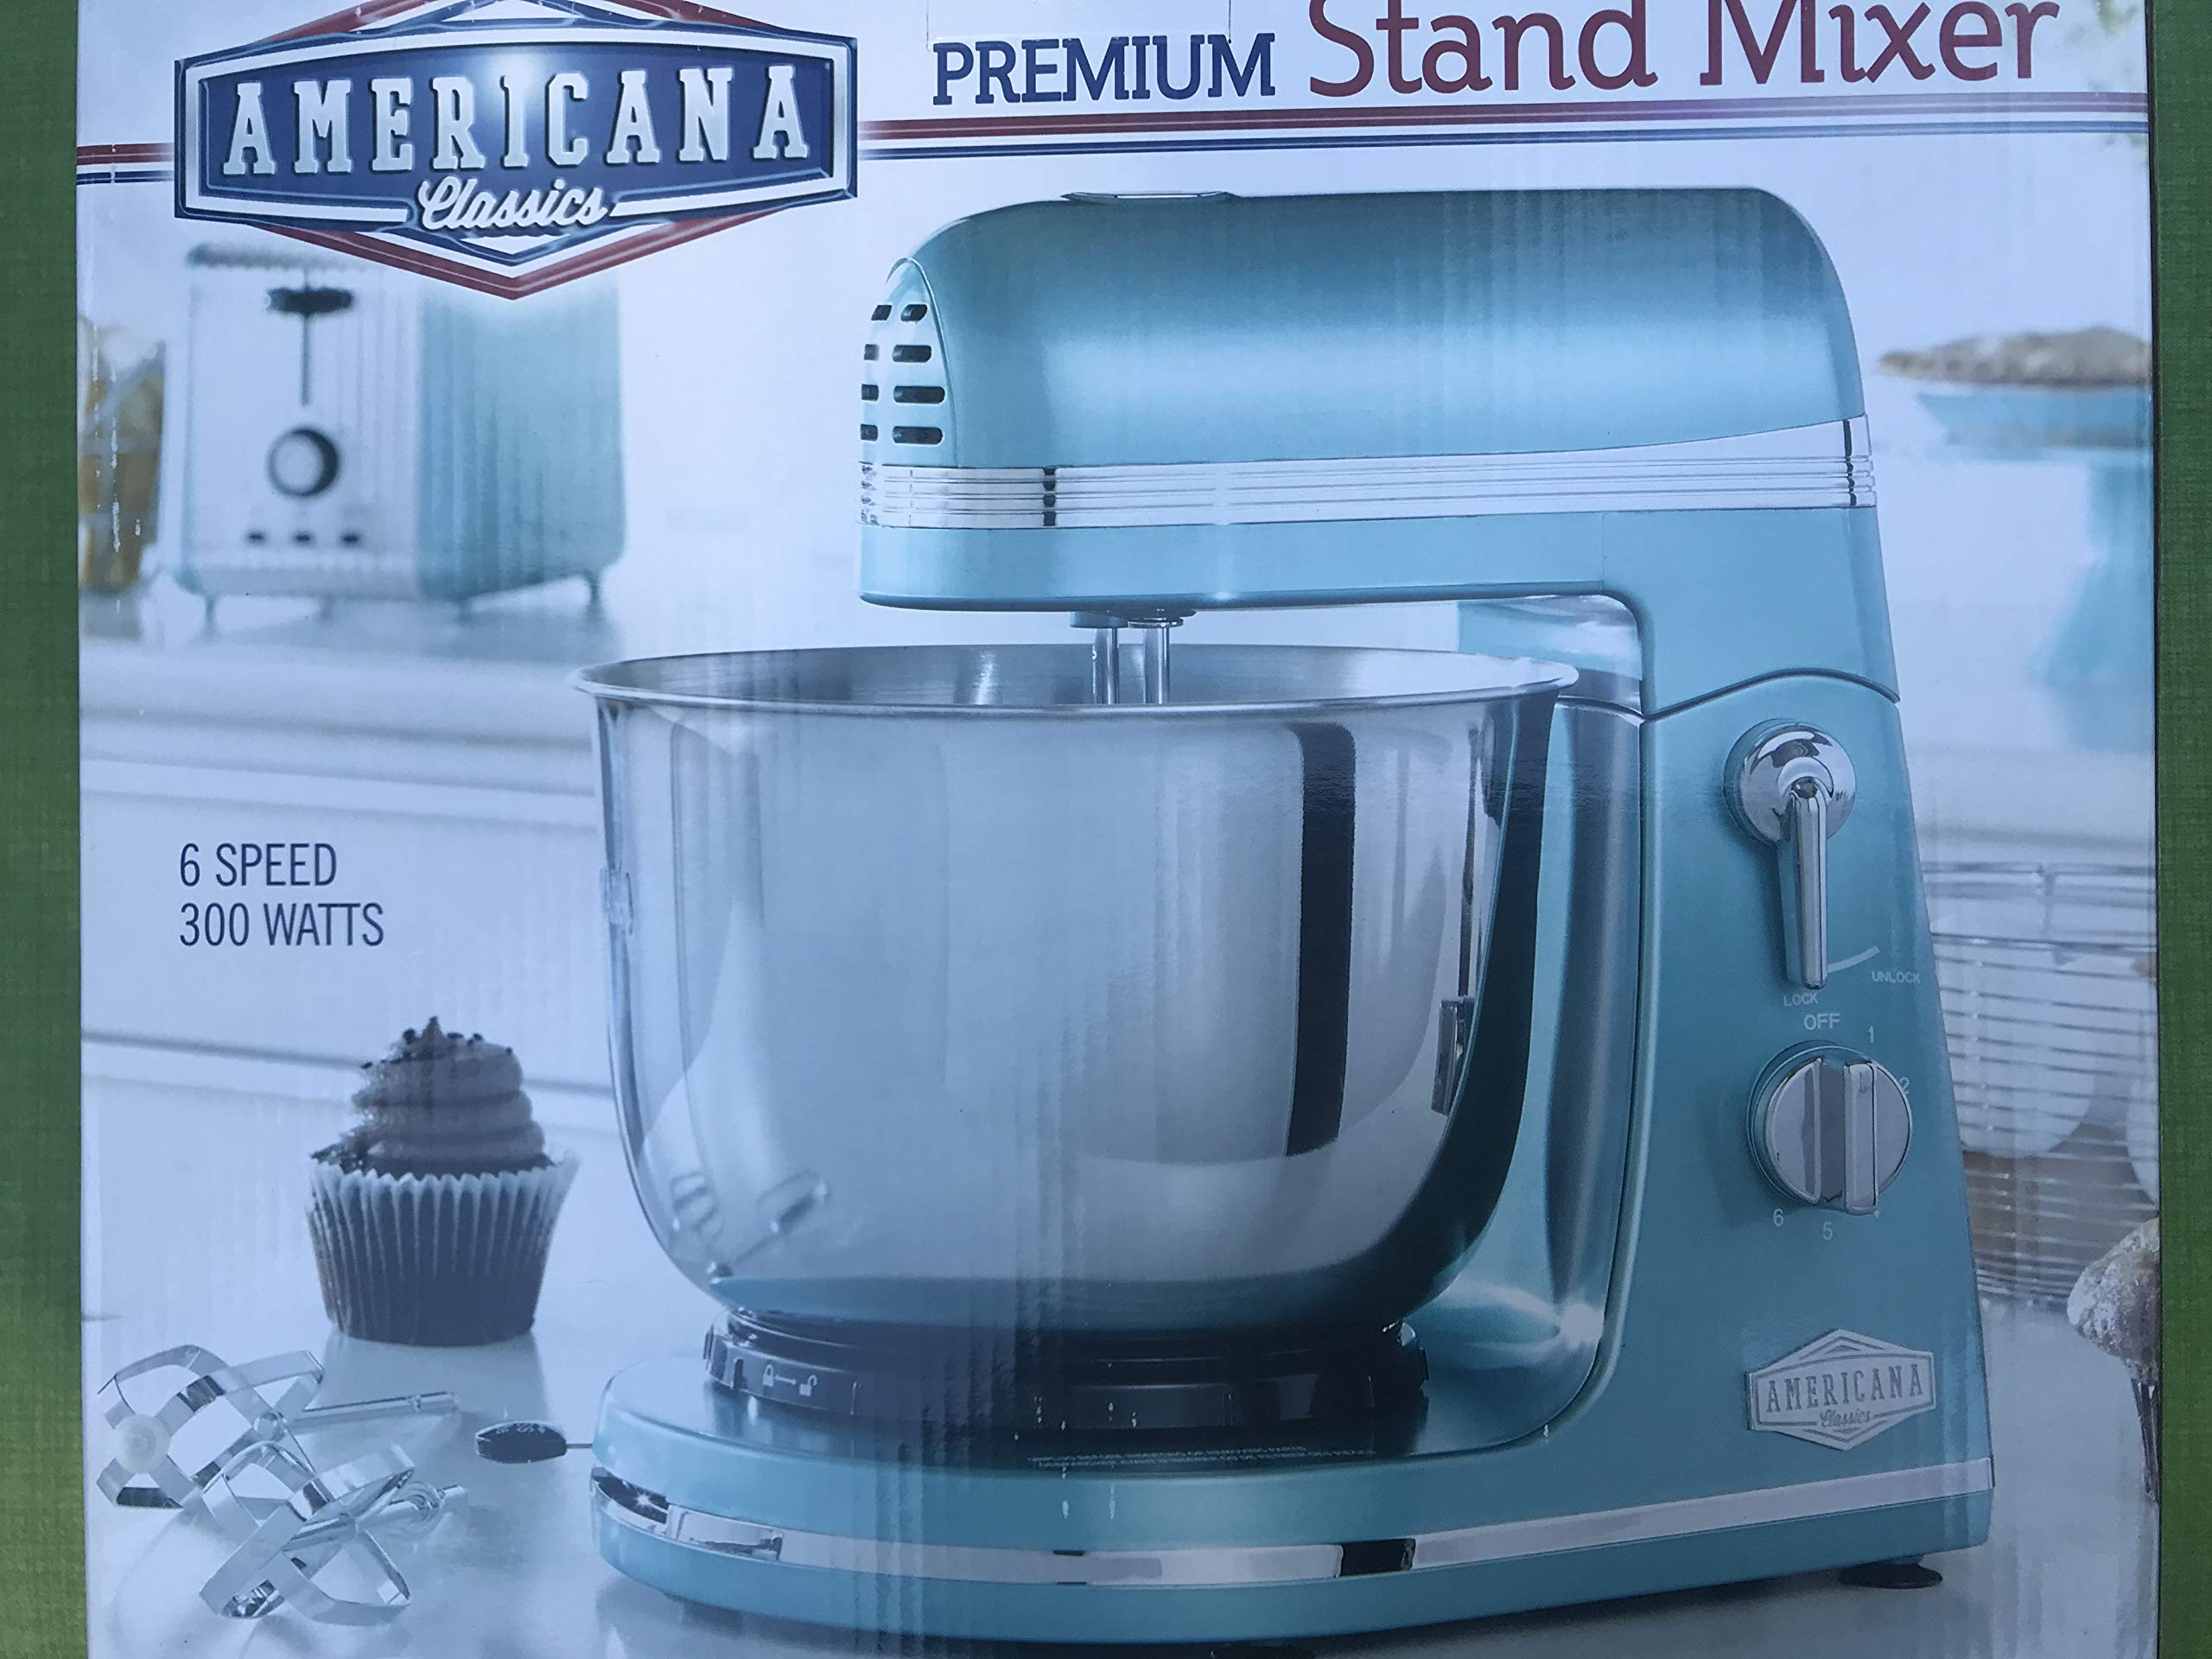 Americana Classics Premium Stand Mixer by Americana Classics